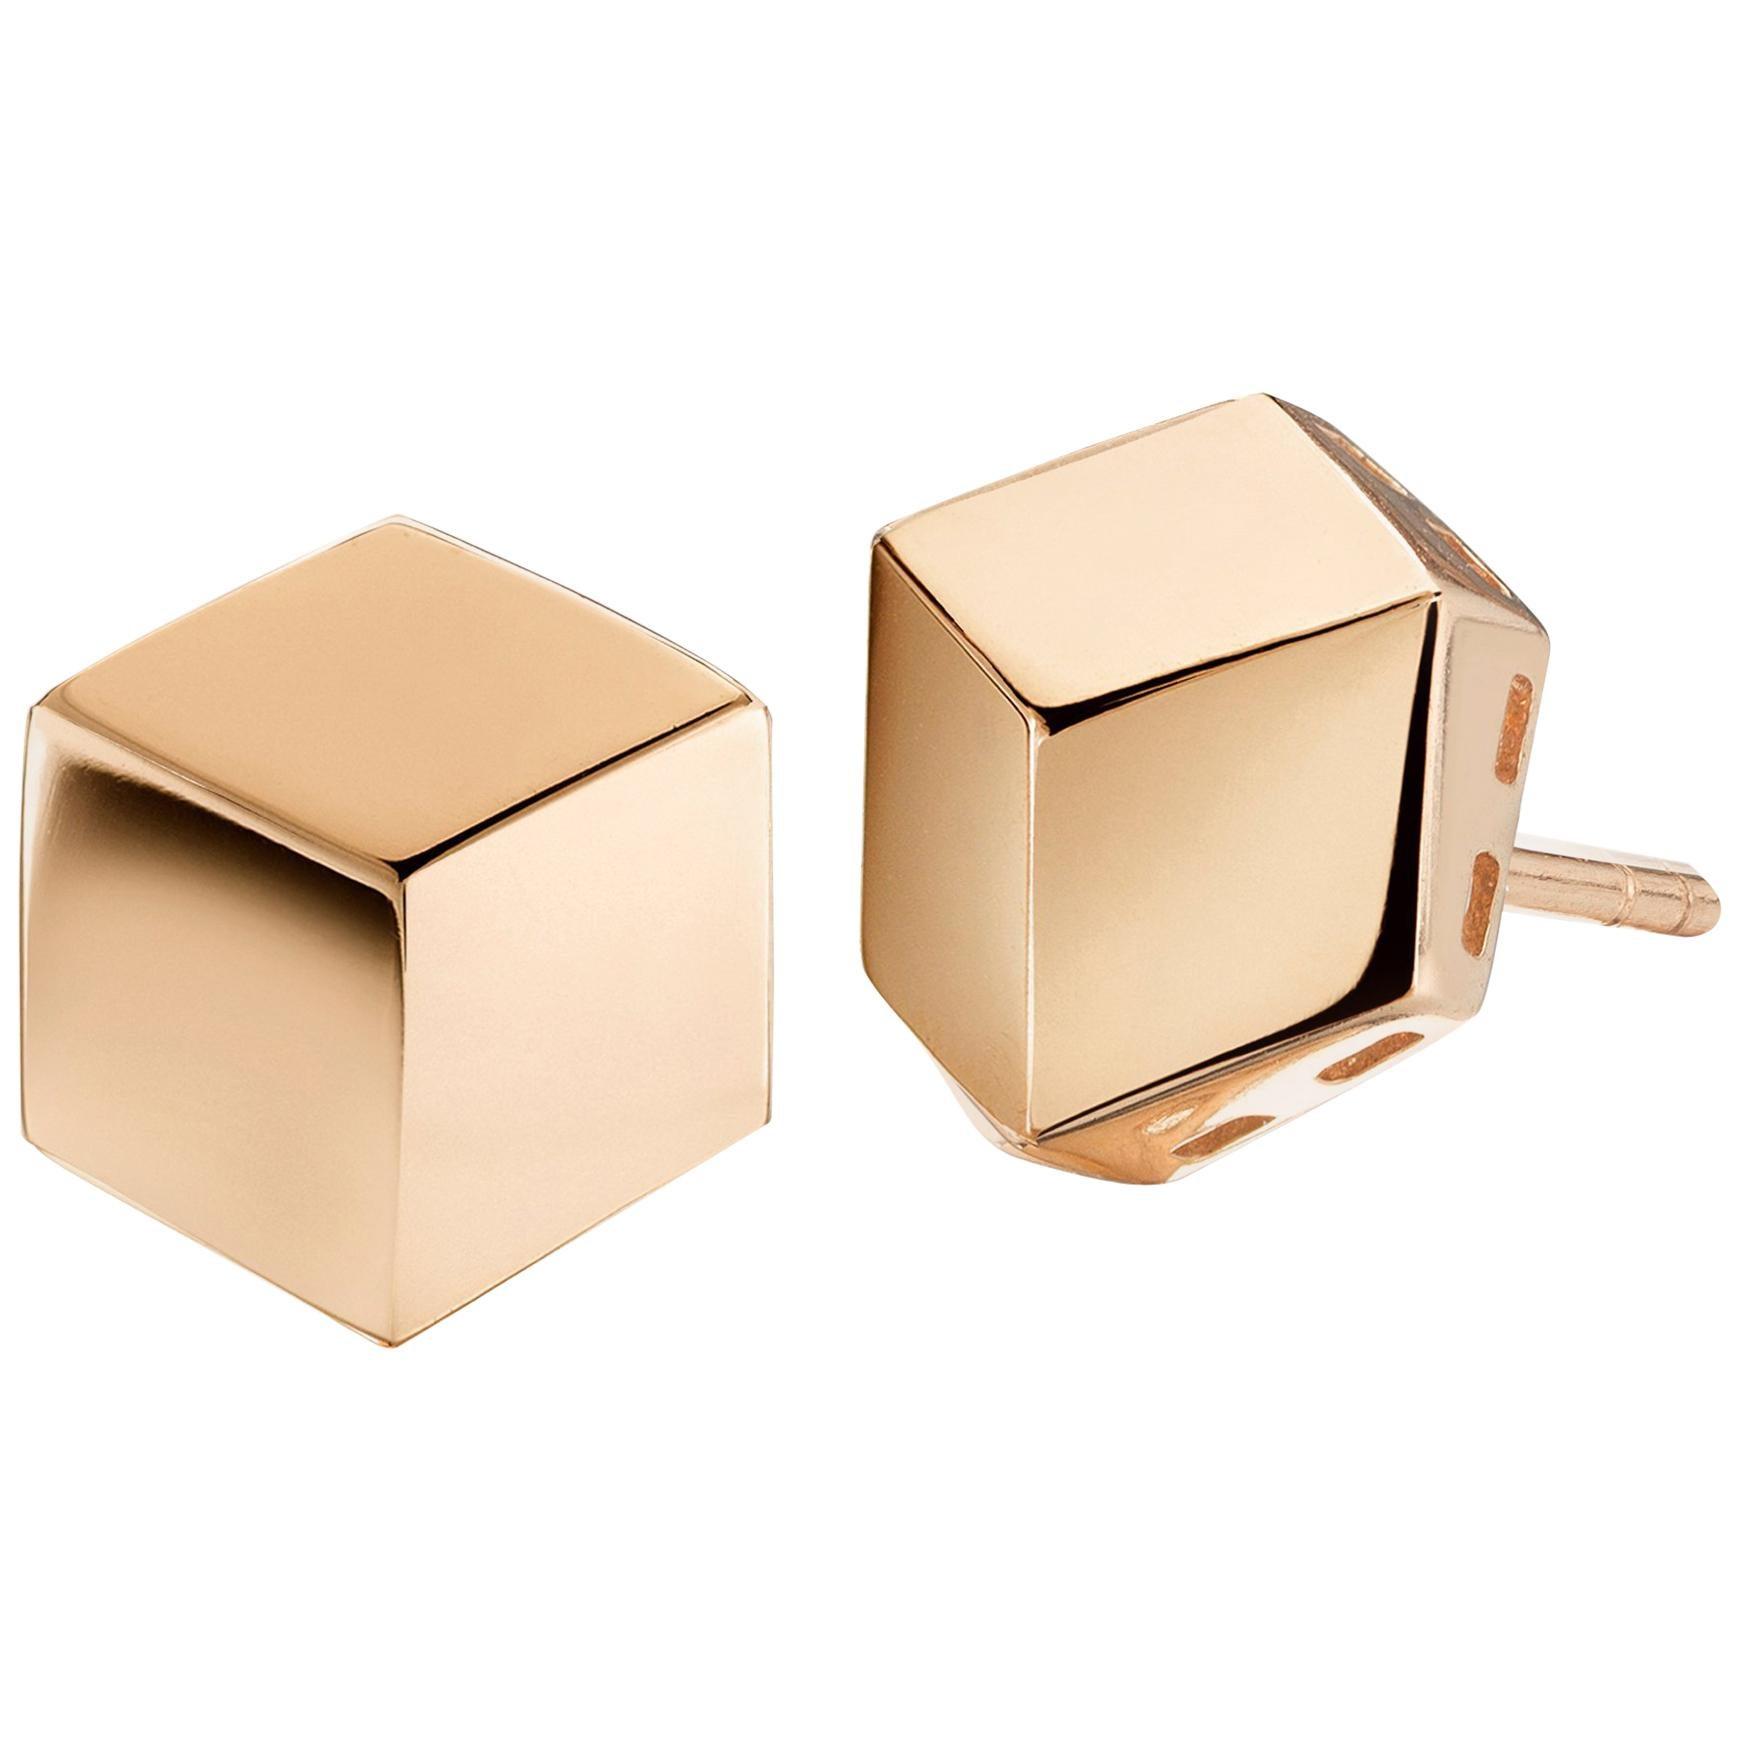 Paolo Costagli 18 Karat Rose Gold Brillante Stud Earrings, Grande